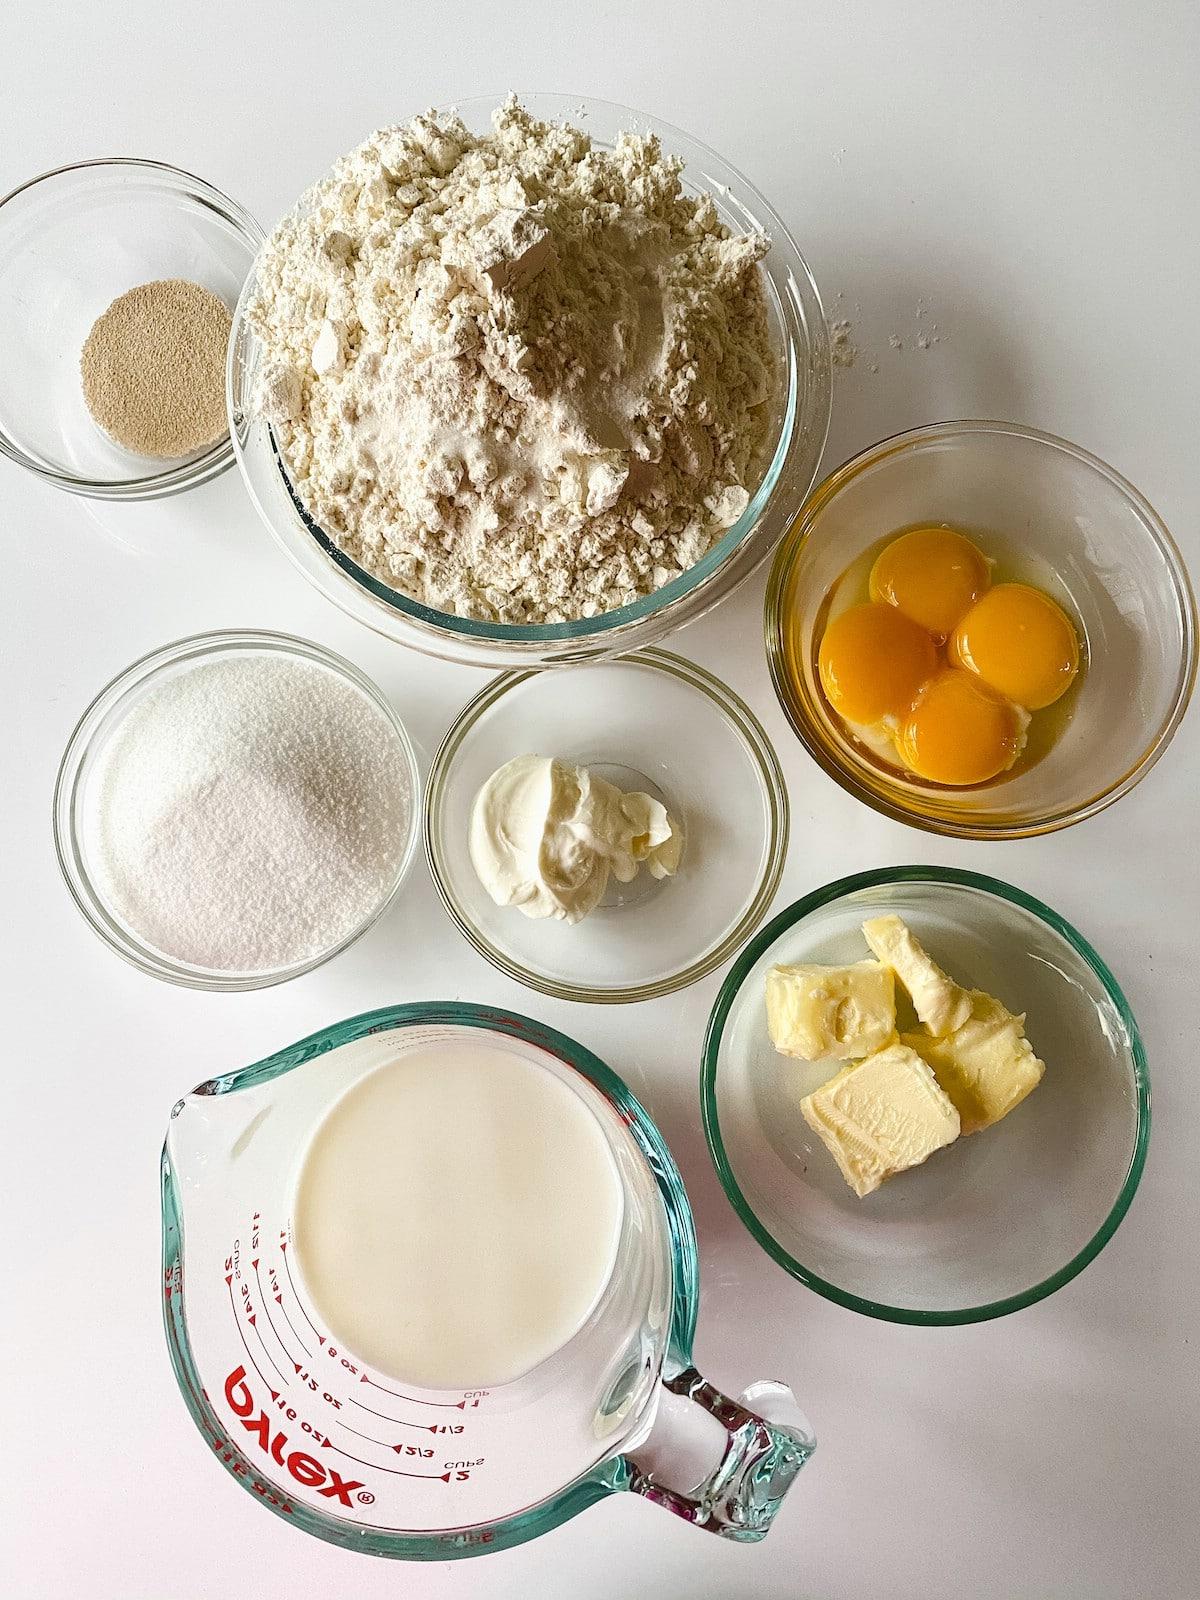 Ingredients for cream cheese danish